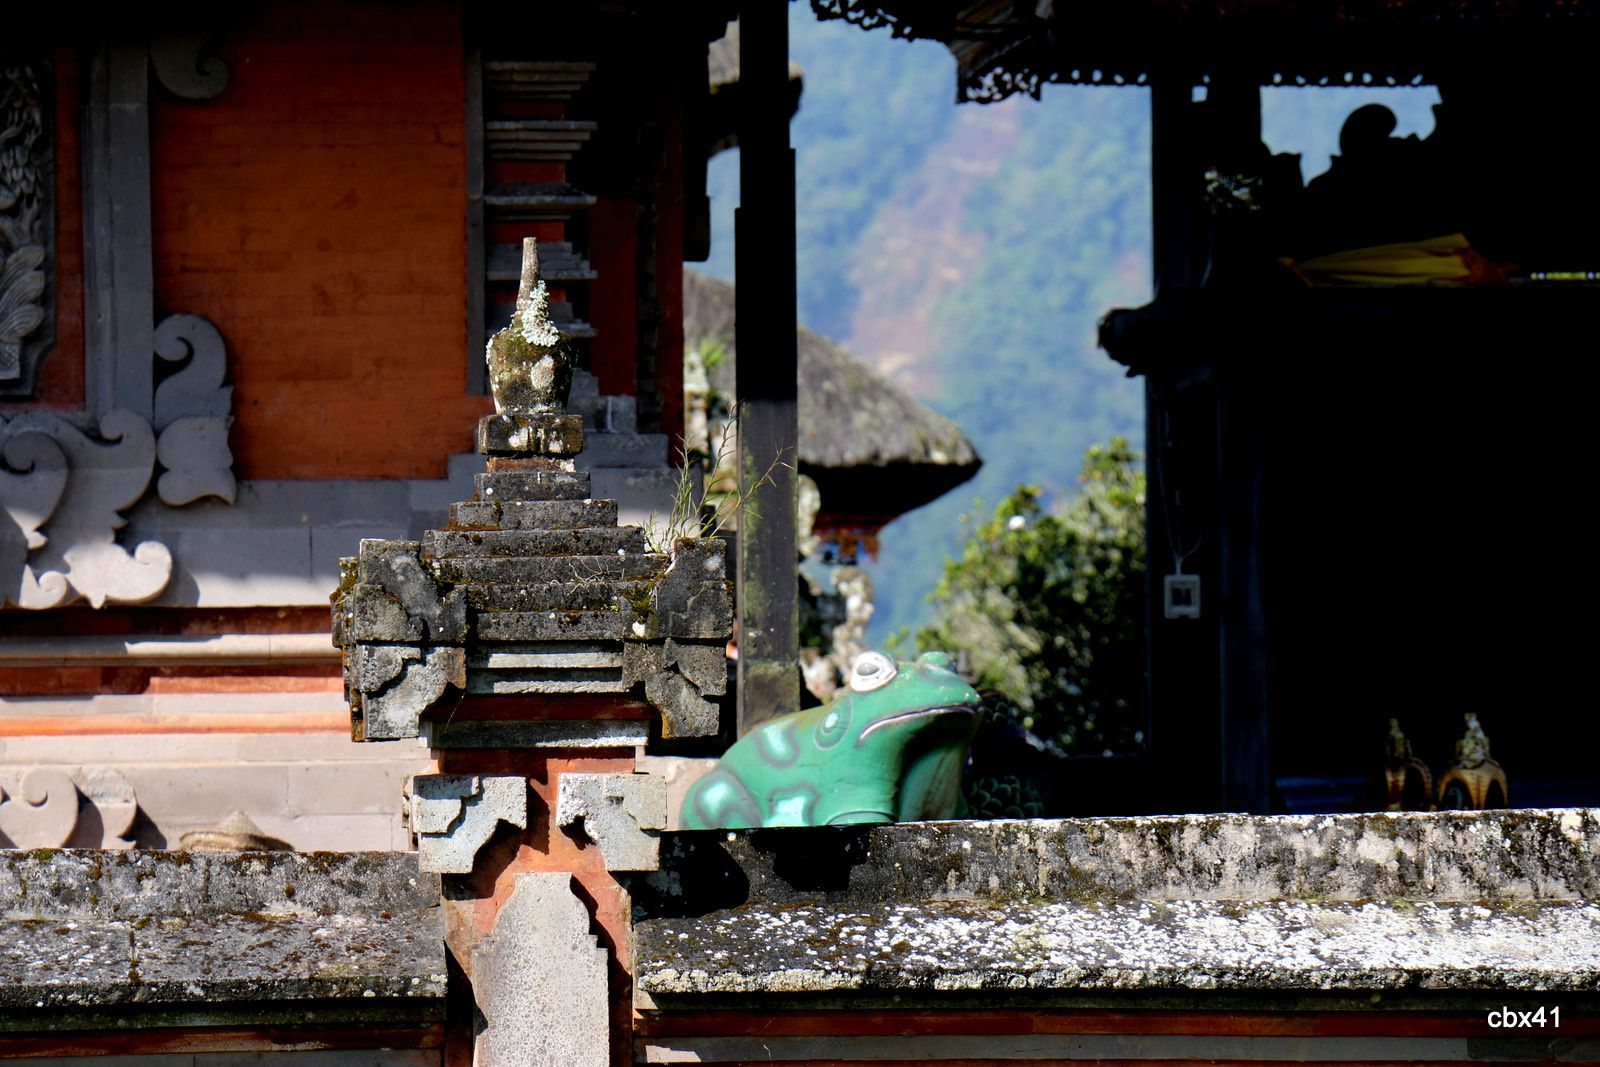 Temple Ulun Danu de Candikuning (Tabanan, Bali), la tour à 11 toits et ses grenouilles